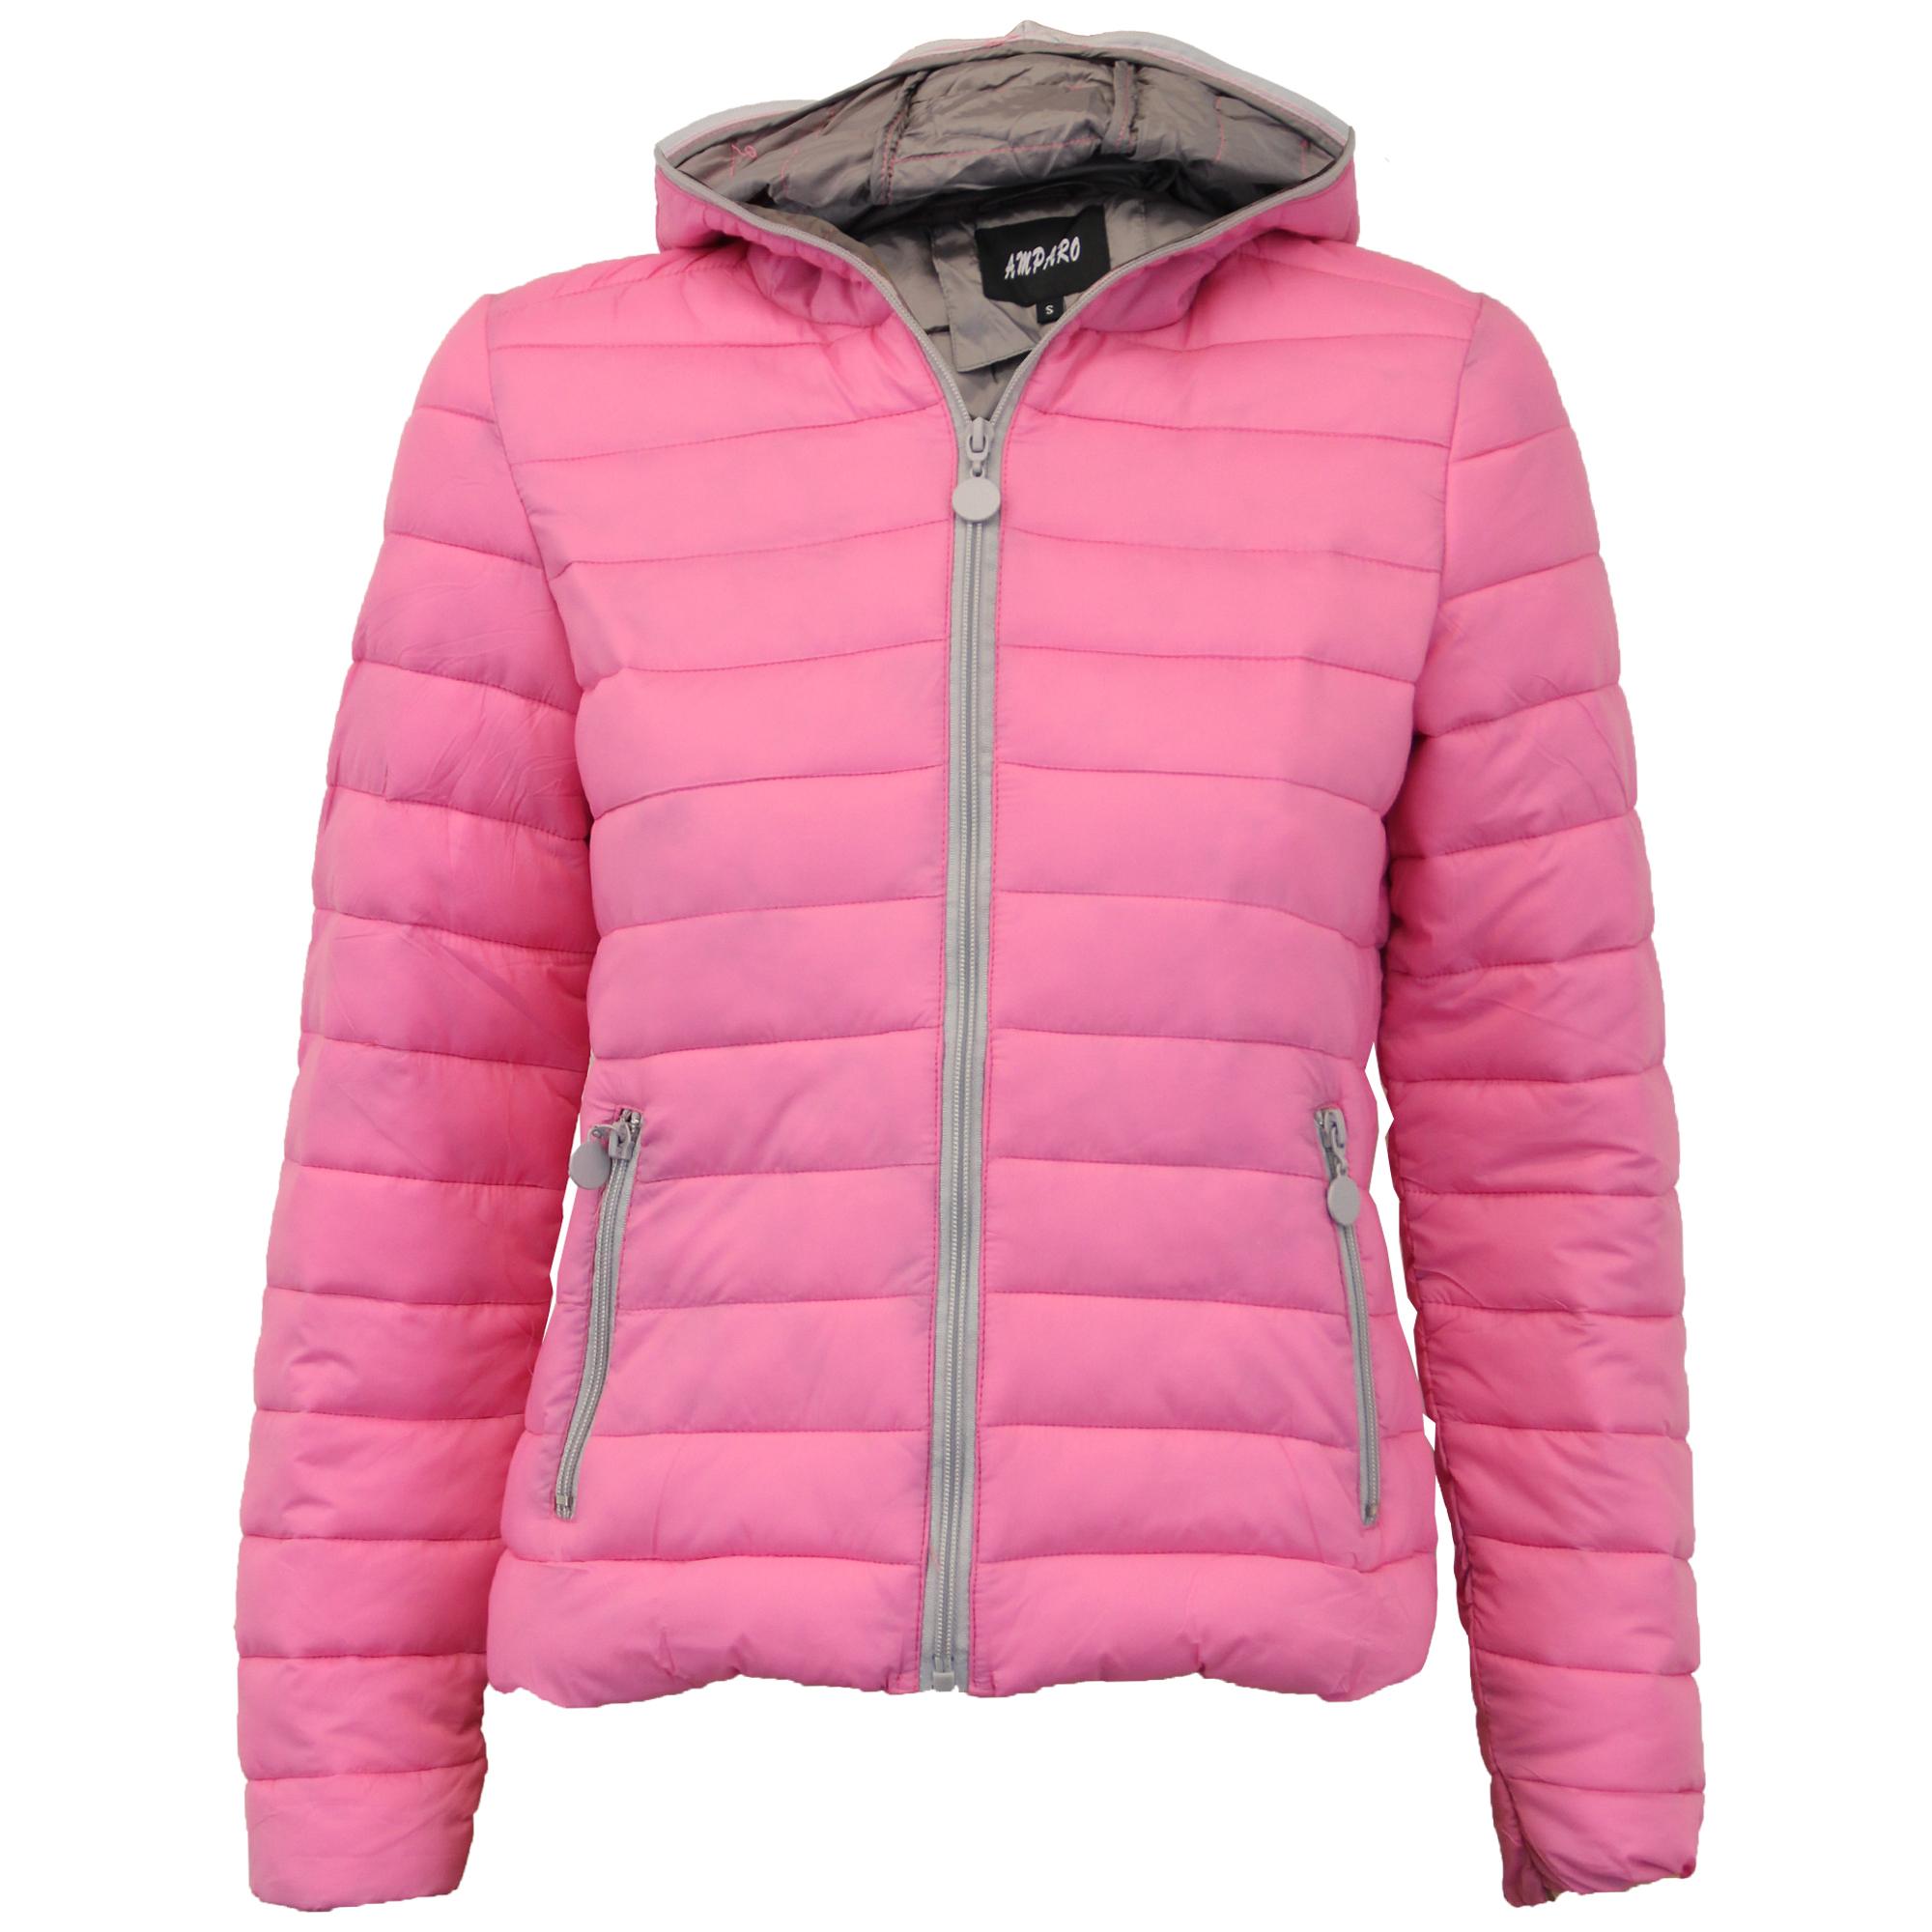 Hooded winter coats women